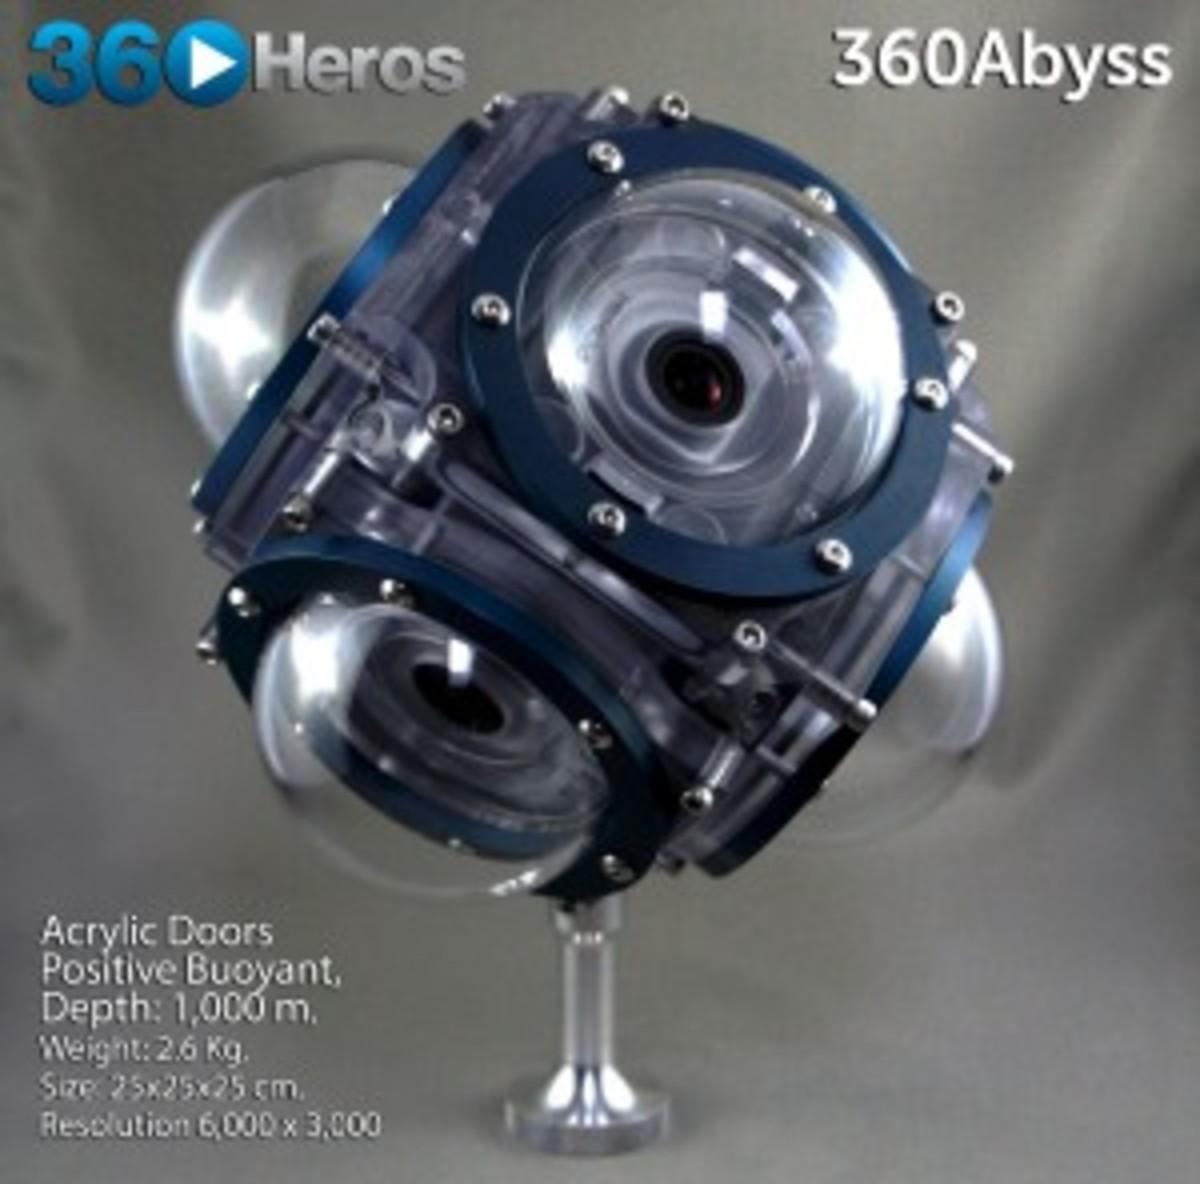 360Heros_360Absys_Clear_HDR4-300x296.jpg